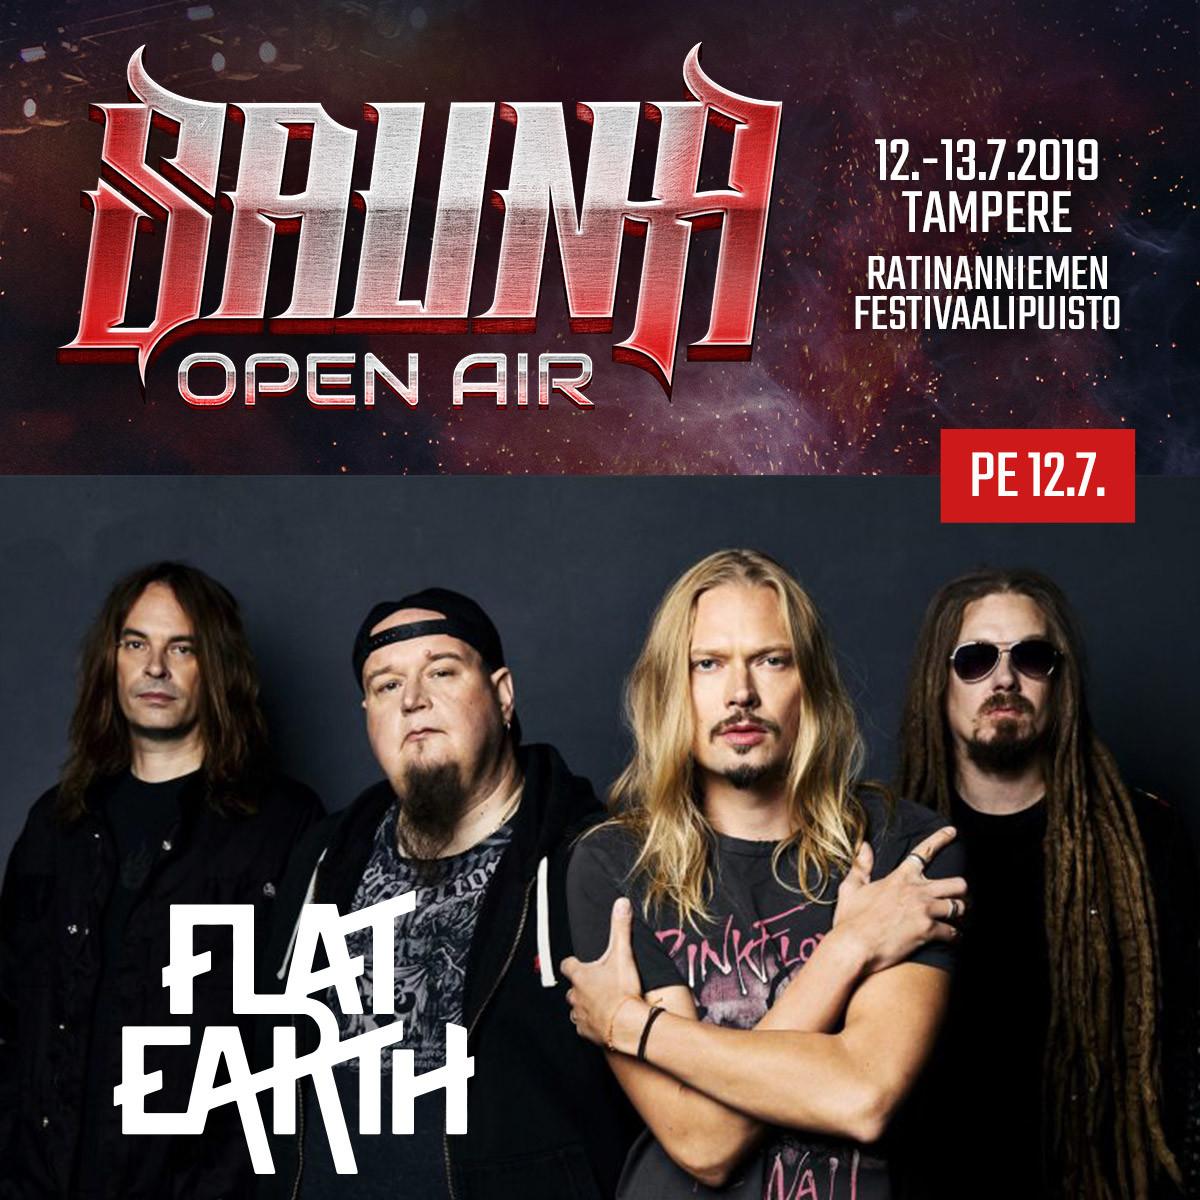 Flat Earth - Sauna Open Air